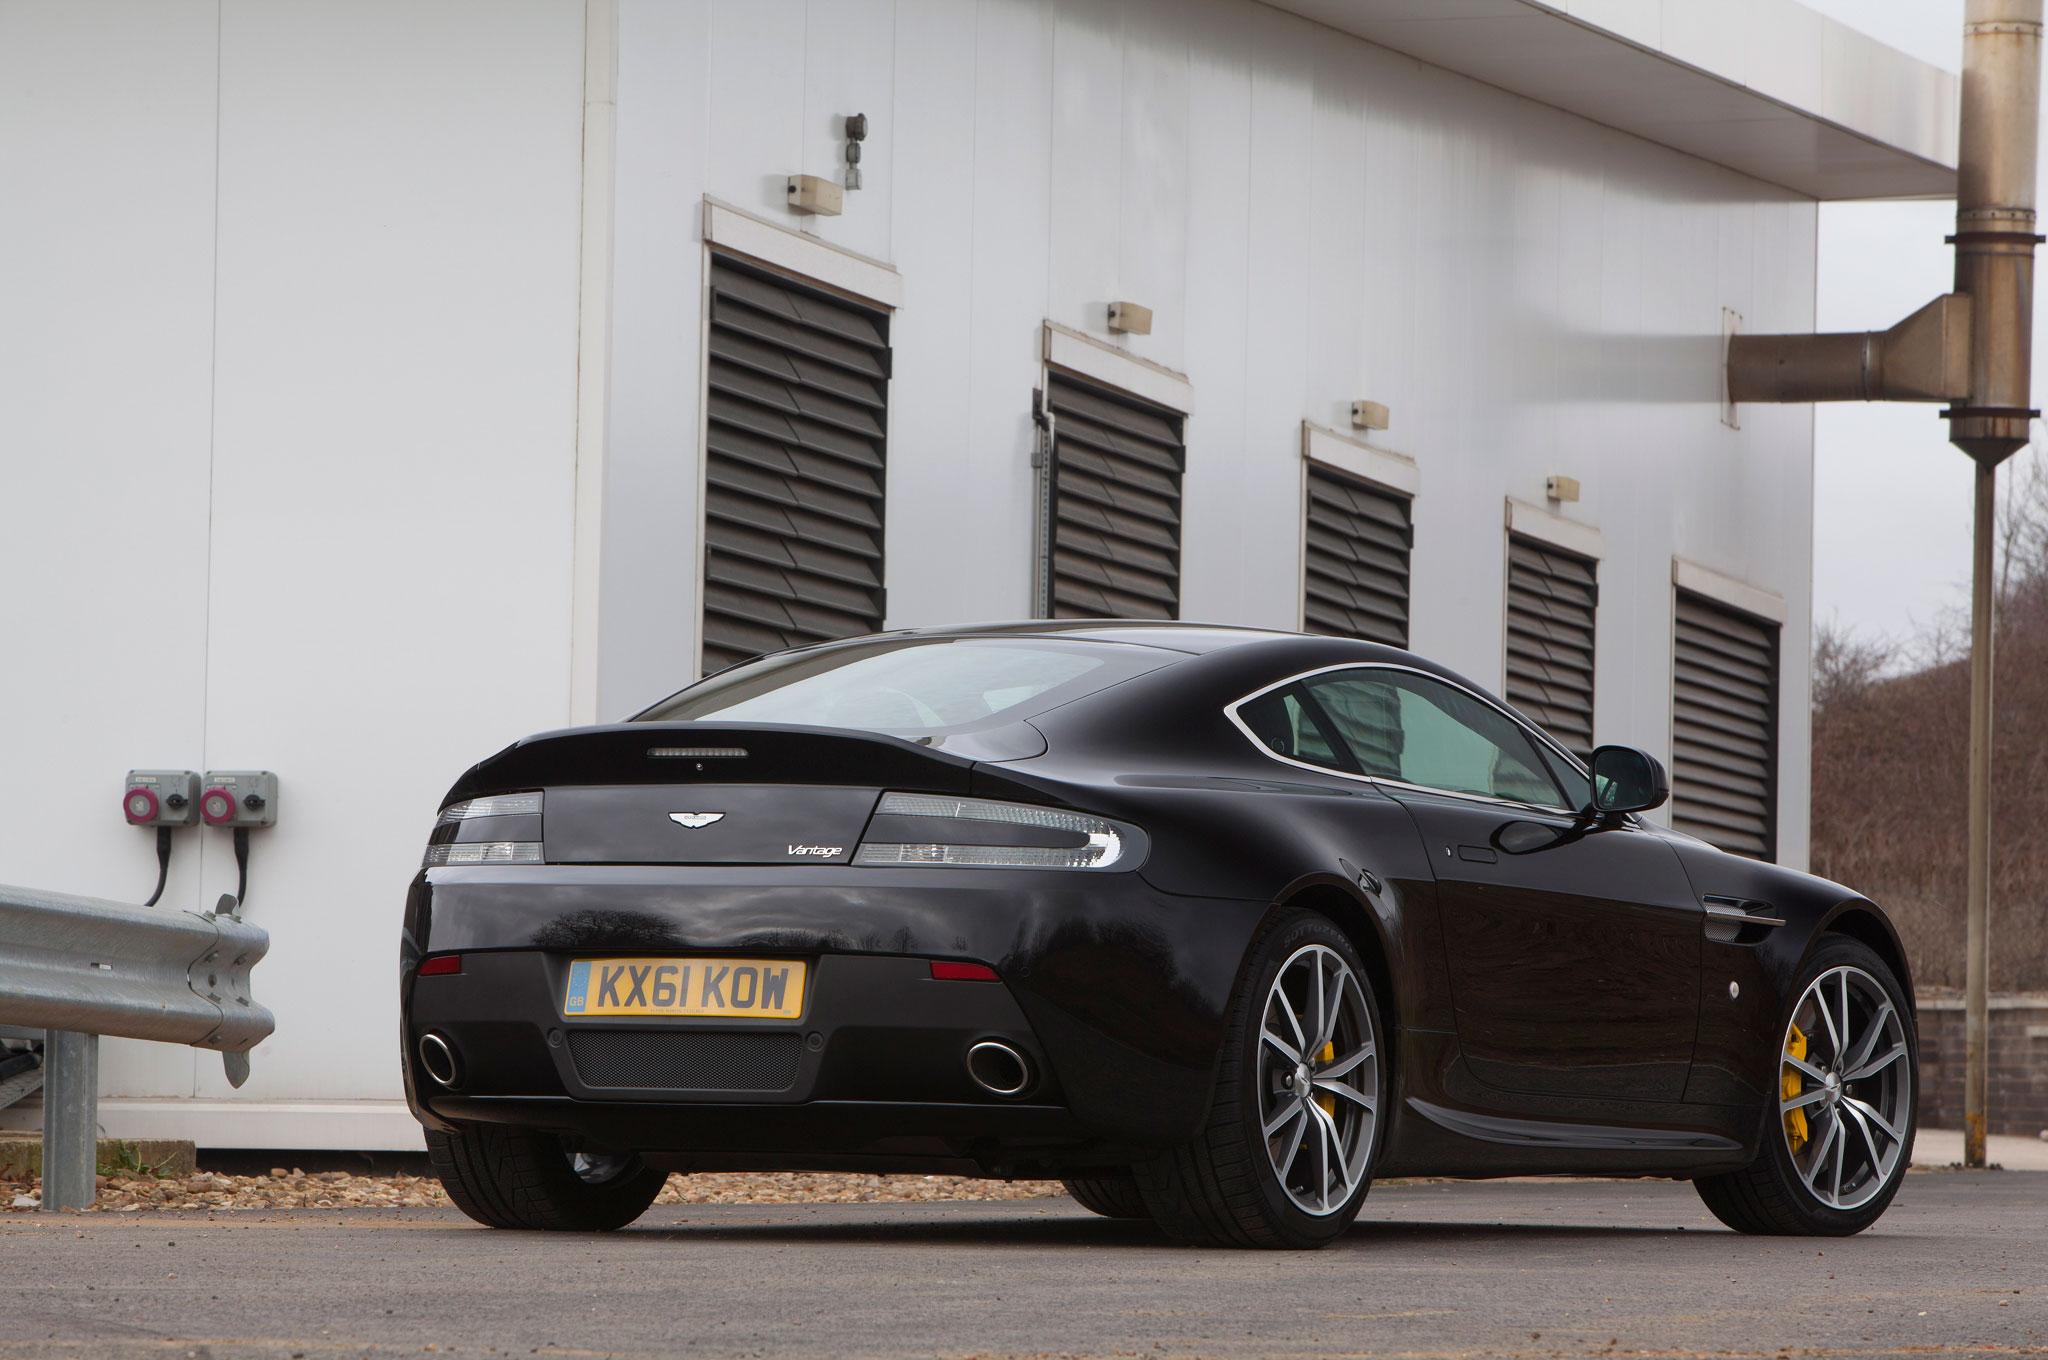 2008 Aston Martin V8 Vantage Roadster - Top Convertible Feature ...